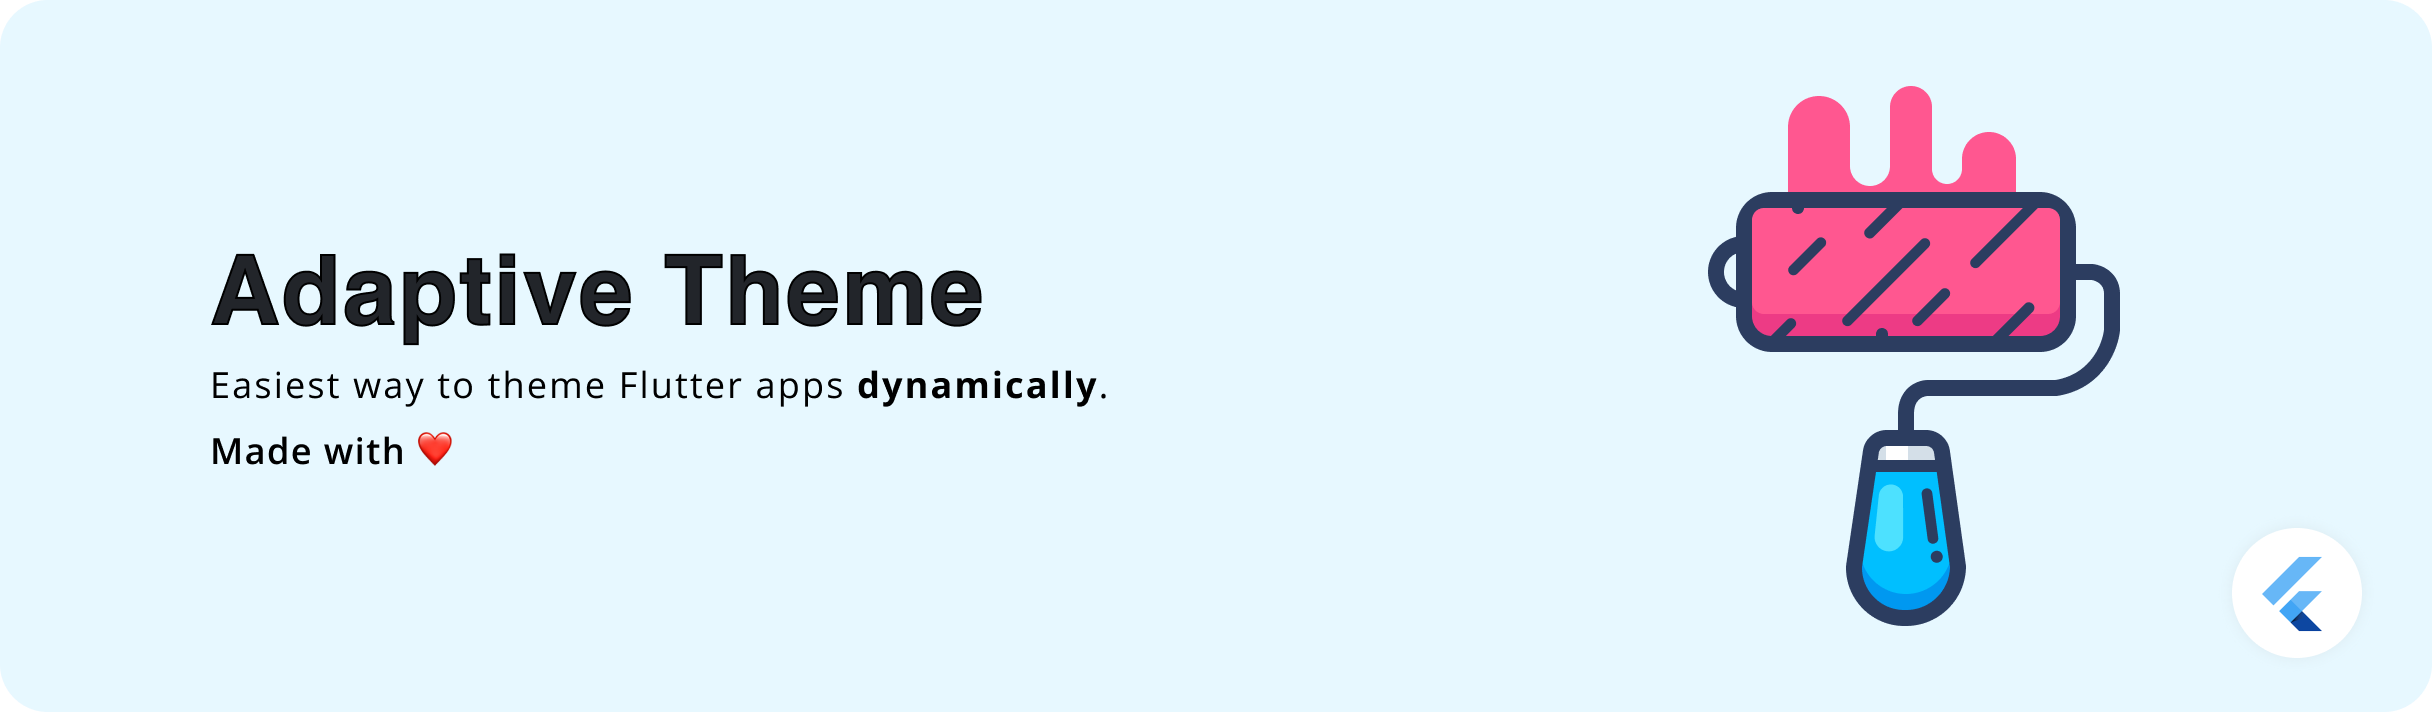 adaptive_theme